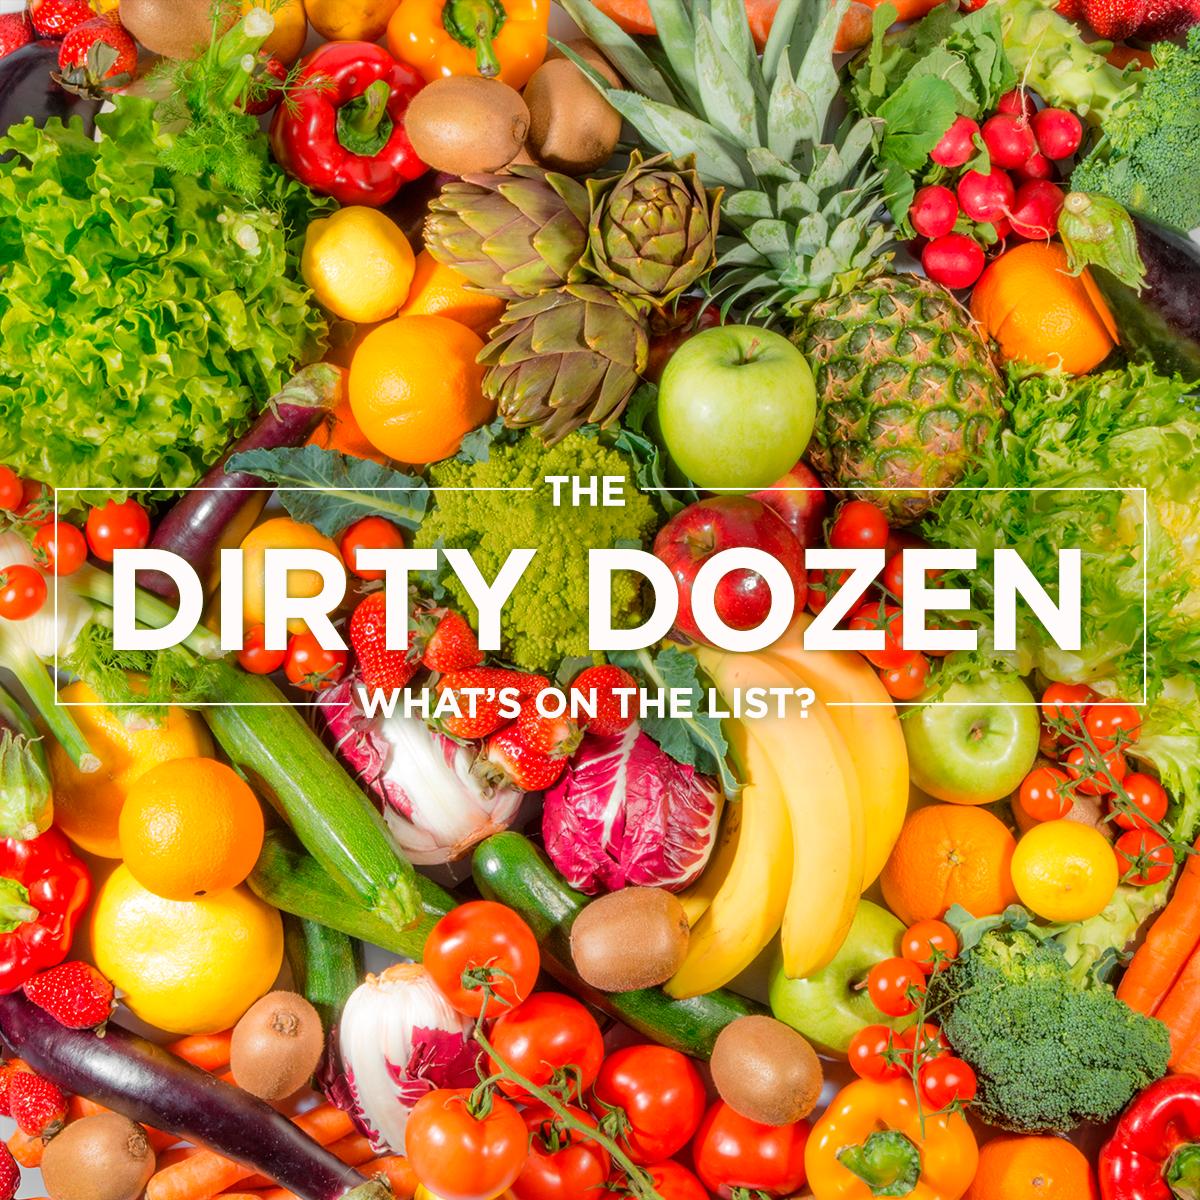 The Top 12 Foods to Buy Organic – Meet the Dirty Dozen